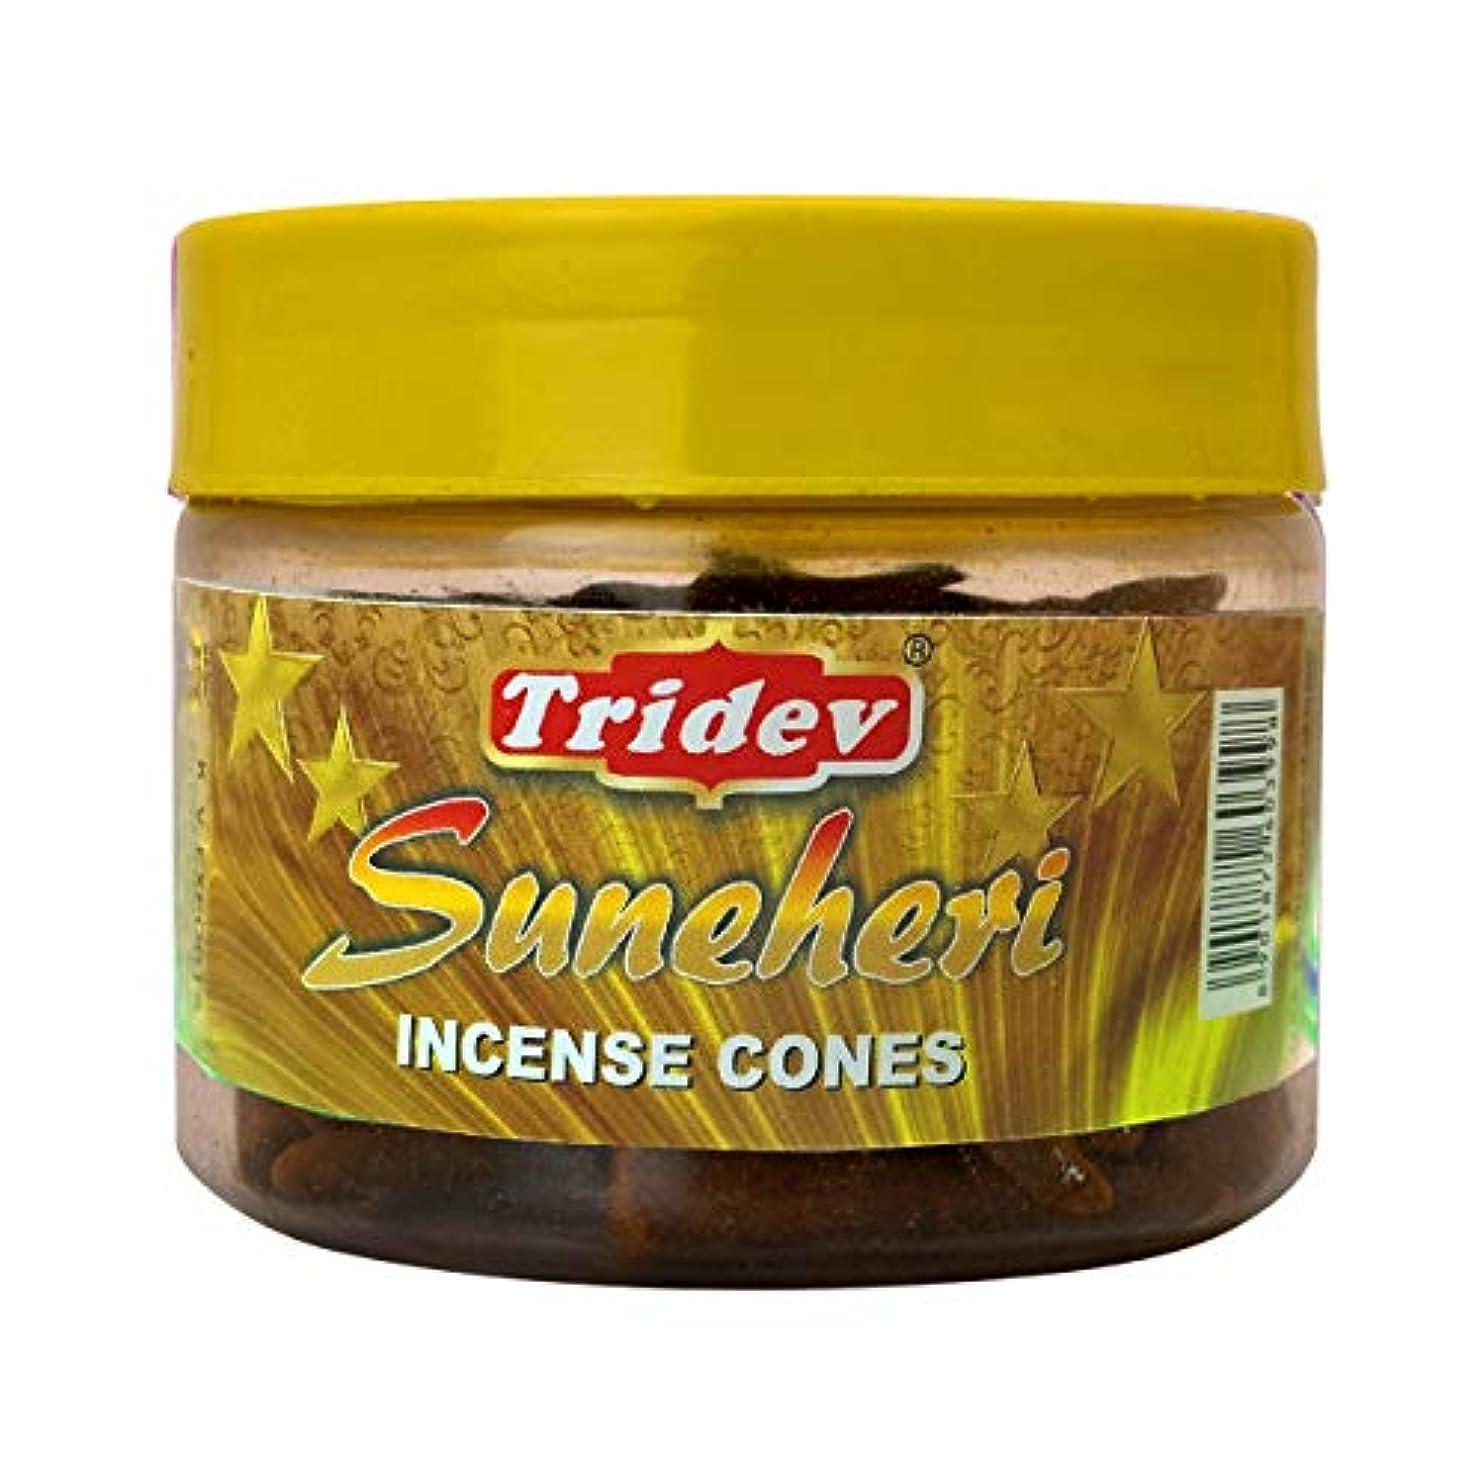 Tridev Sunehri フレグランス コーン型お香瓶 1080グラム ボックス入り 12個入り 輸出品質